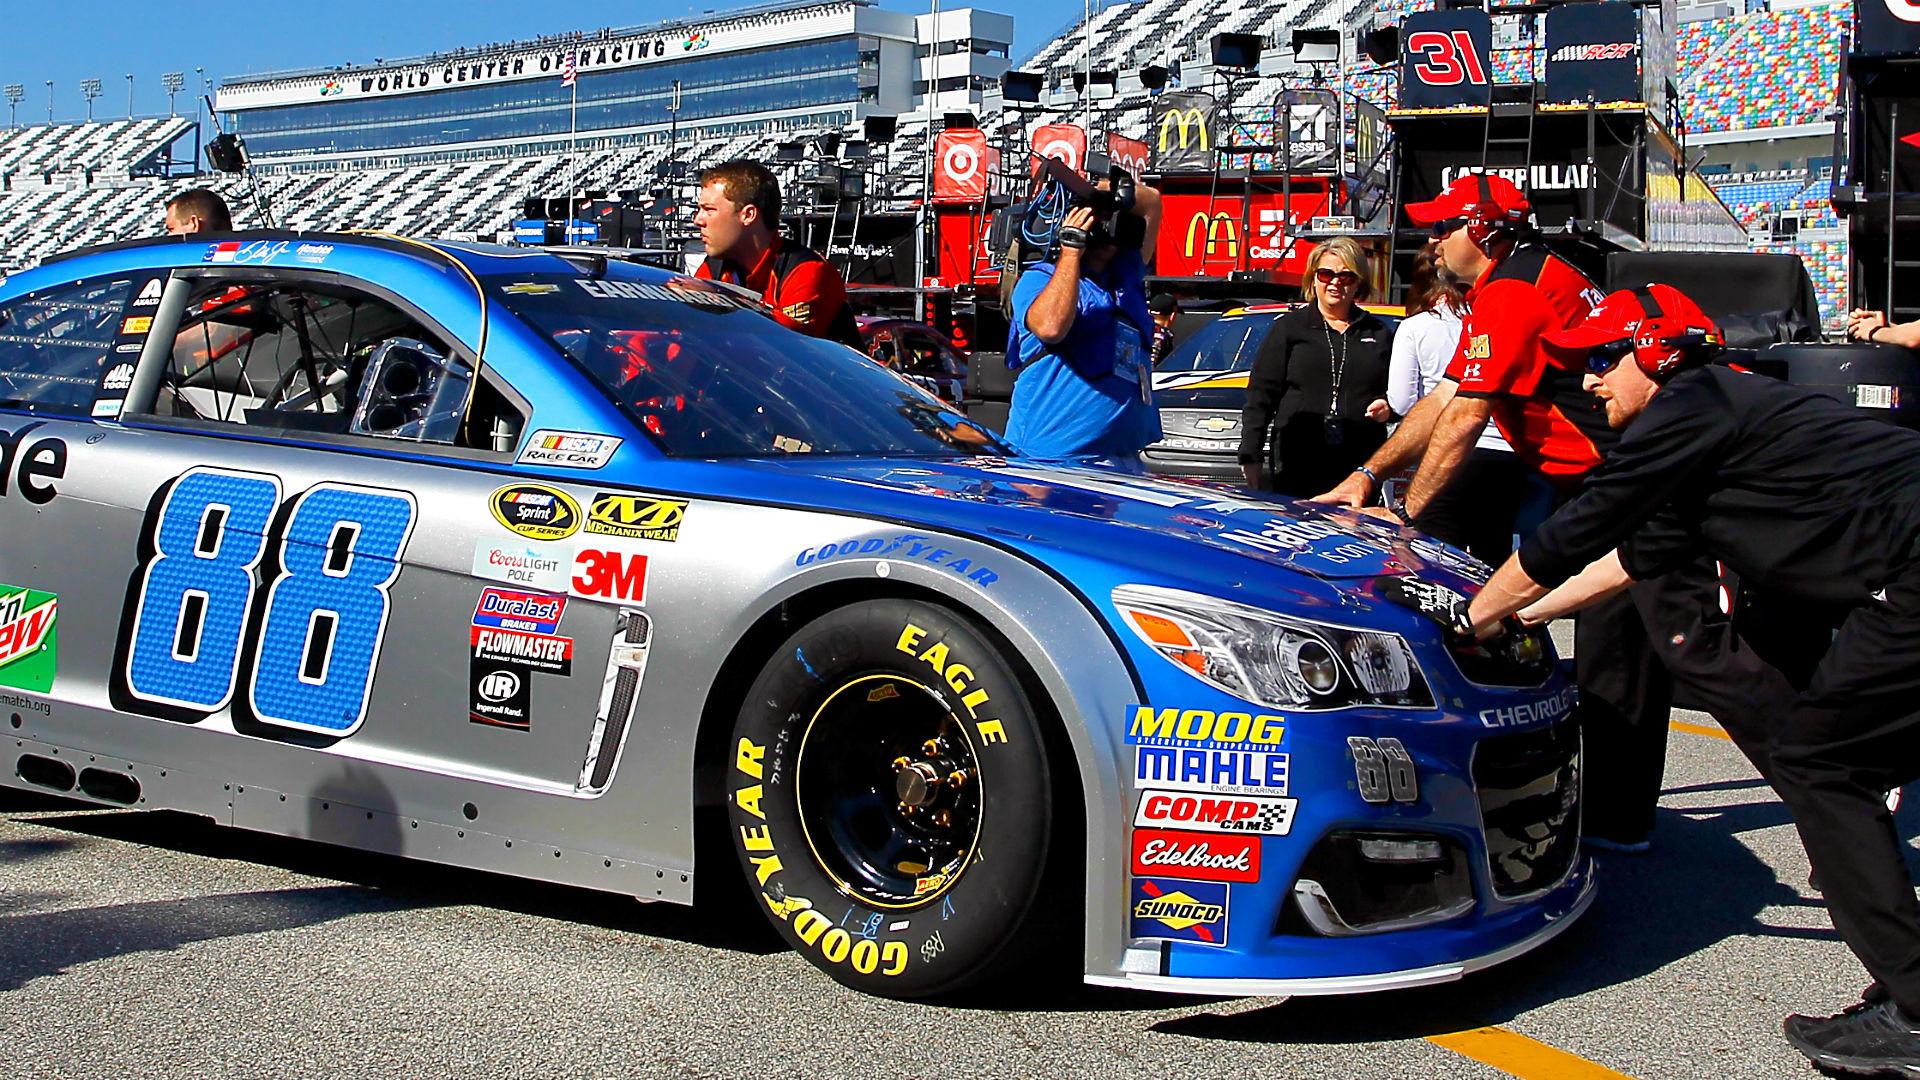 Dale Earnhardt Jr. fastest in first Daytona 500 practice | NASCAR |  Sporting News